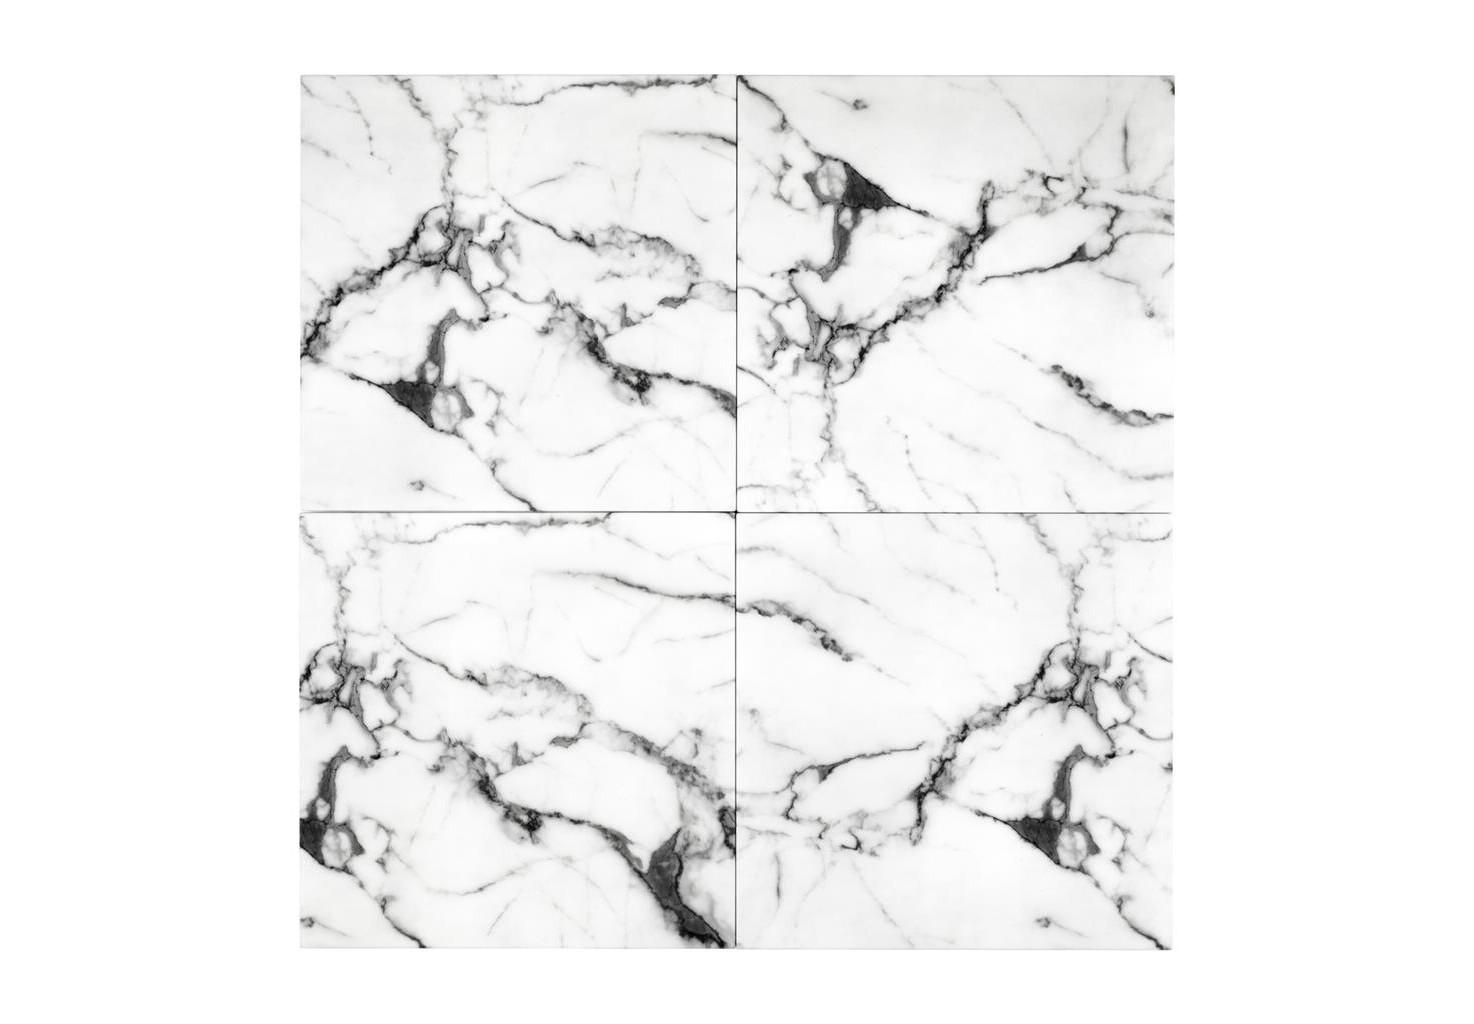 АксессуарПанно<br>Декоративная настенная панель из 4-х частей Wall decoration faux marble set of 4 выполнена из мрамора белого цвета.<br><br>Material: Мрамор<br>Width см: 60<br>Height см: 60